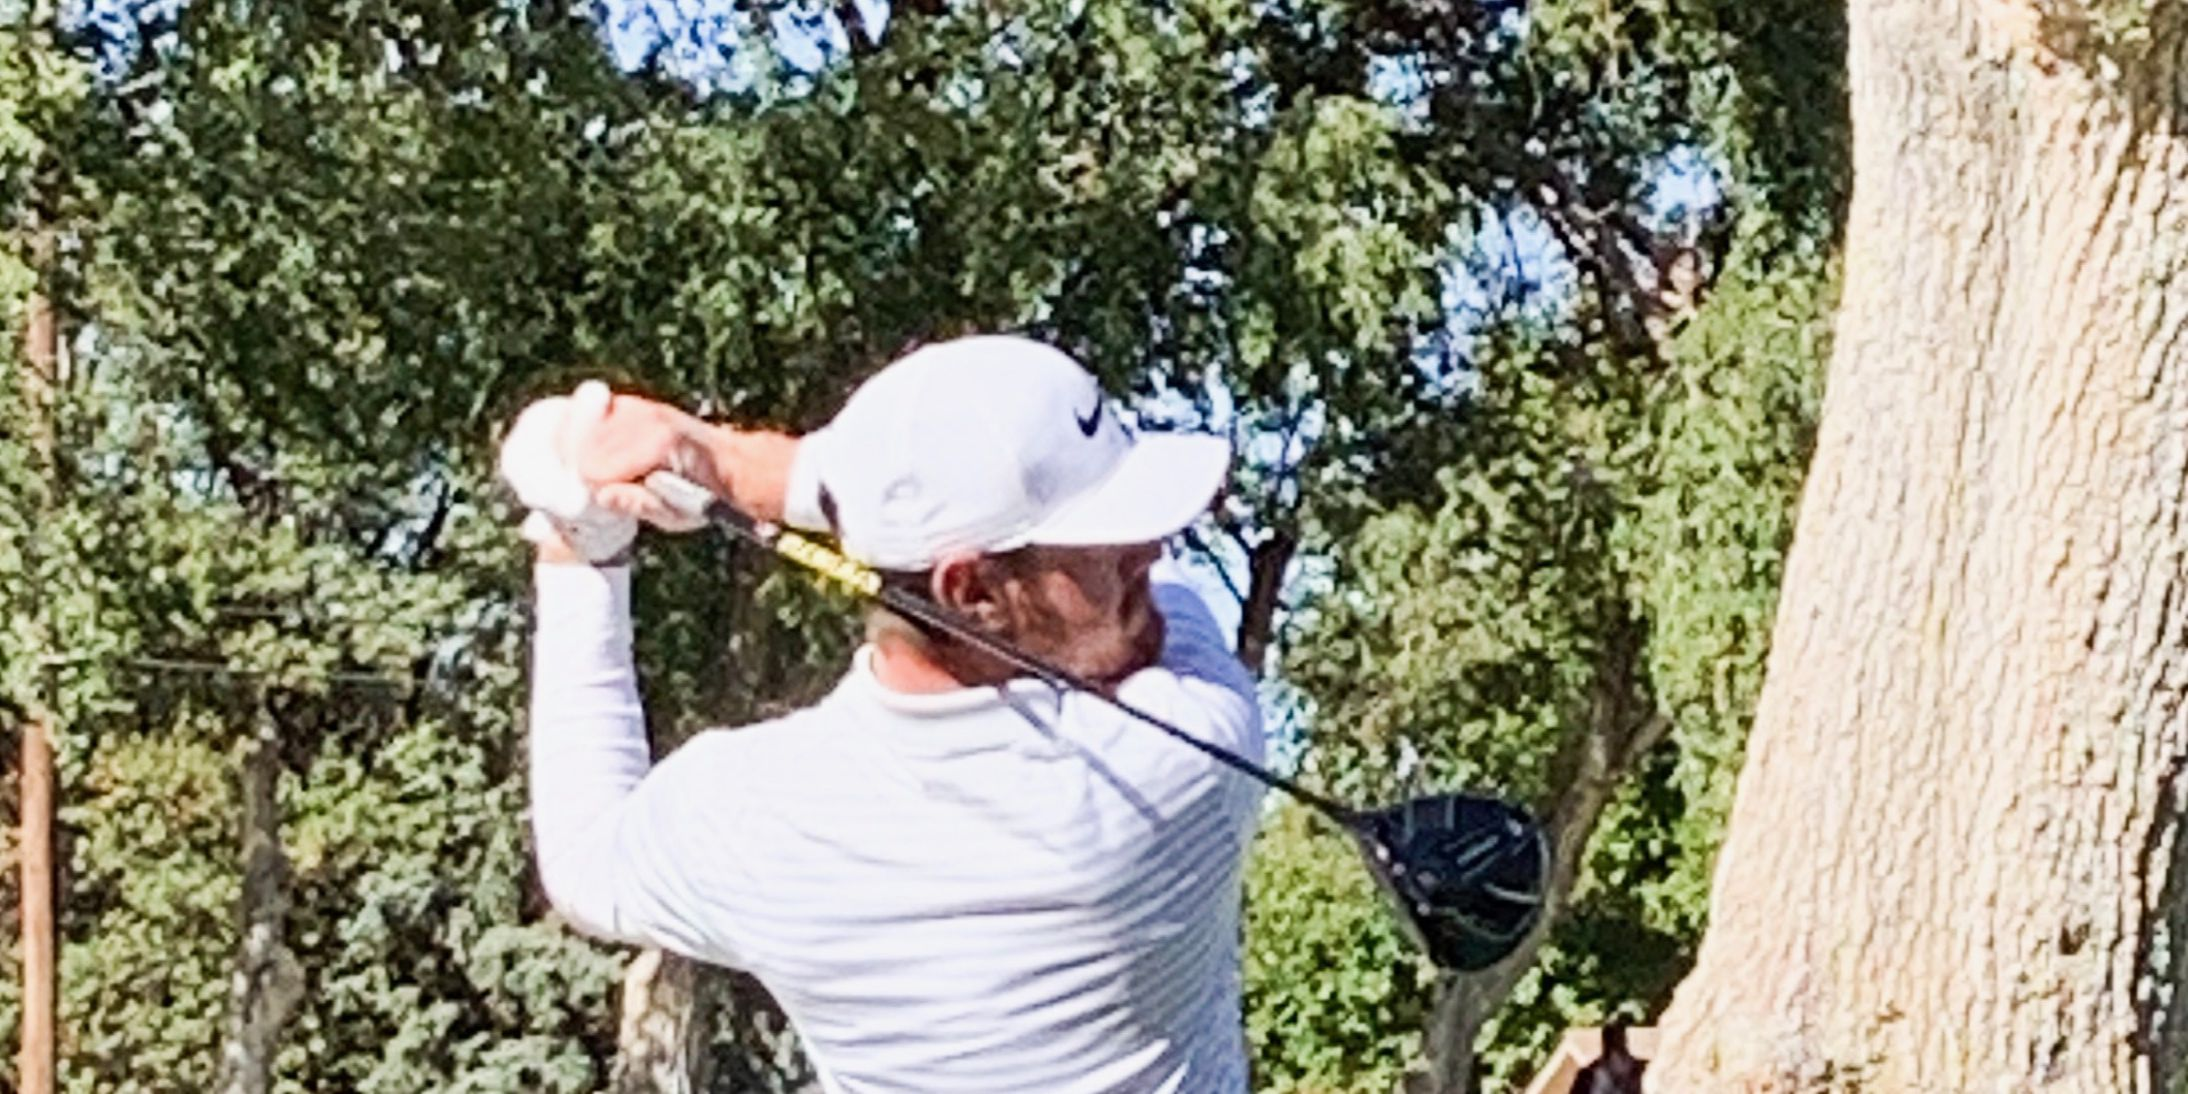 McNeese golf lands JUCO standout, Jake Leatherwood